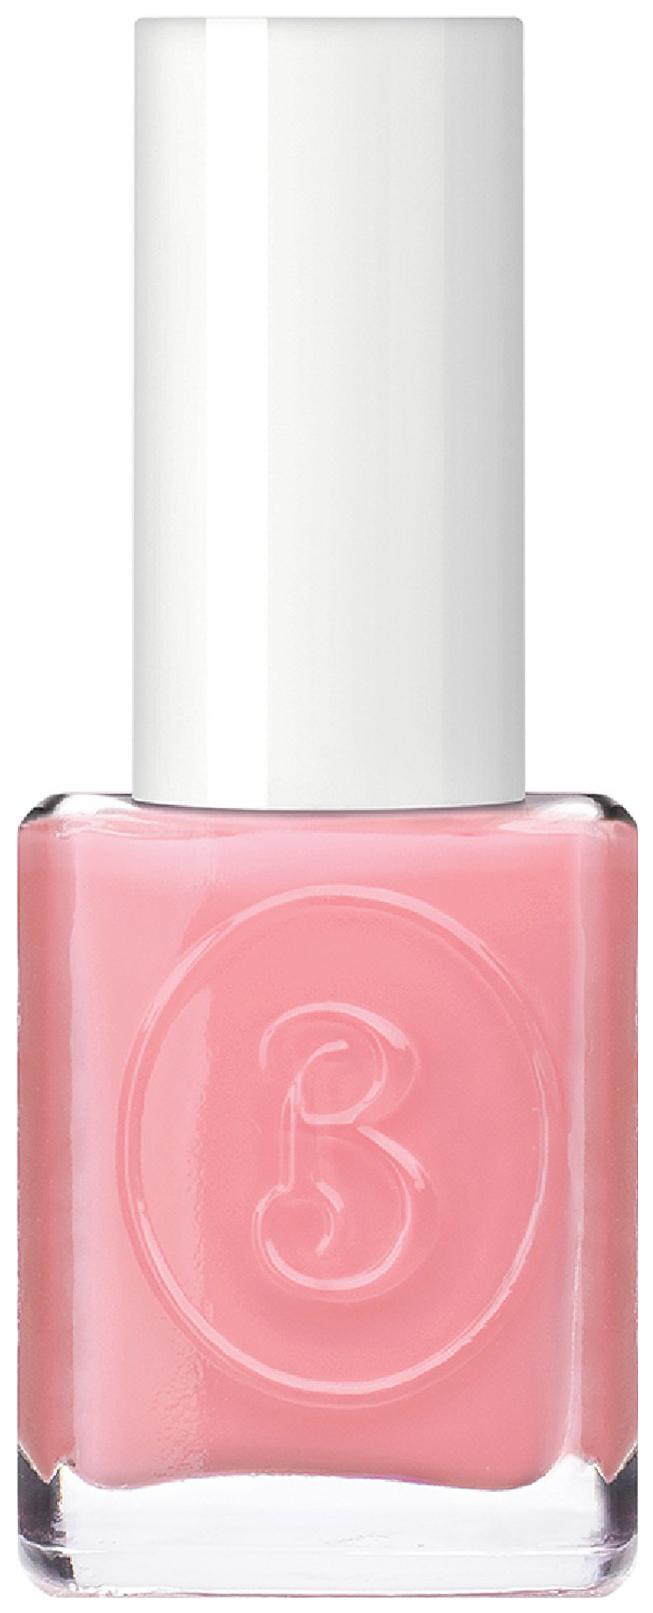 Лак для ногтей Berenice Oxygen Nail Lacquer 94 Romantic Dates 15 мл по цене 415